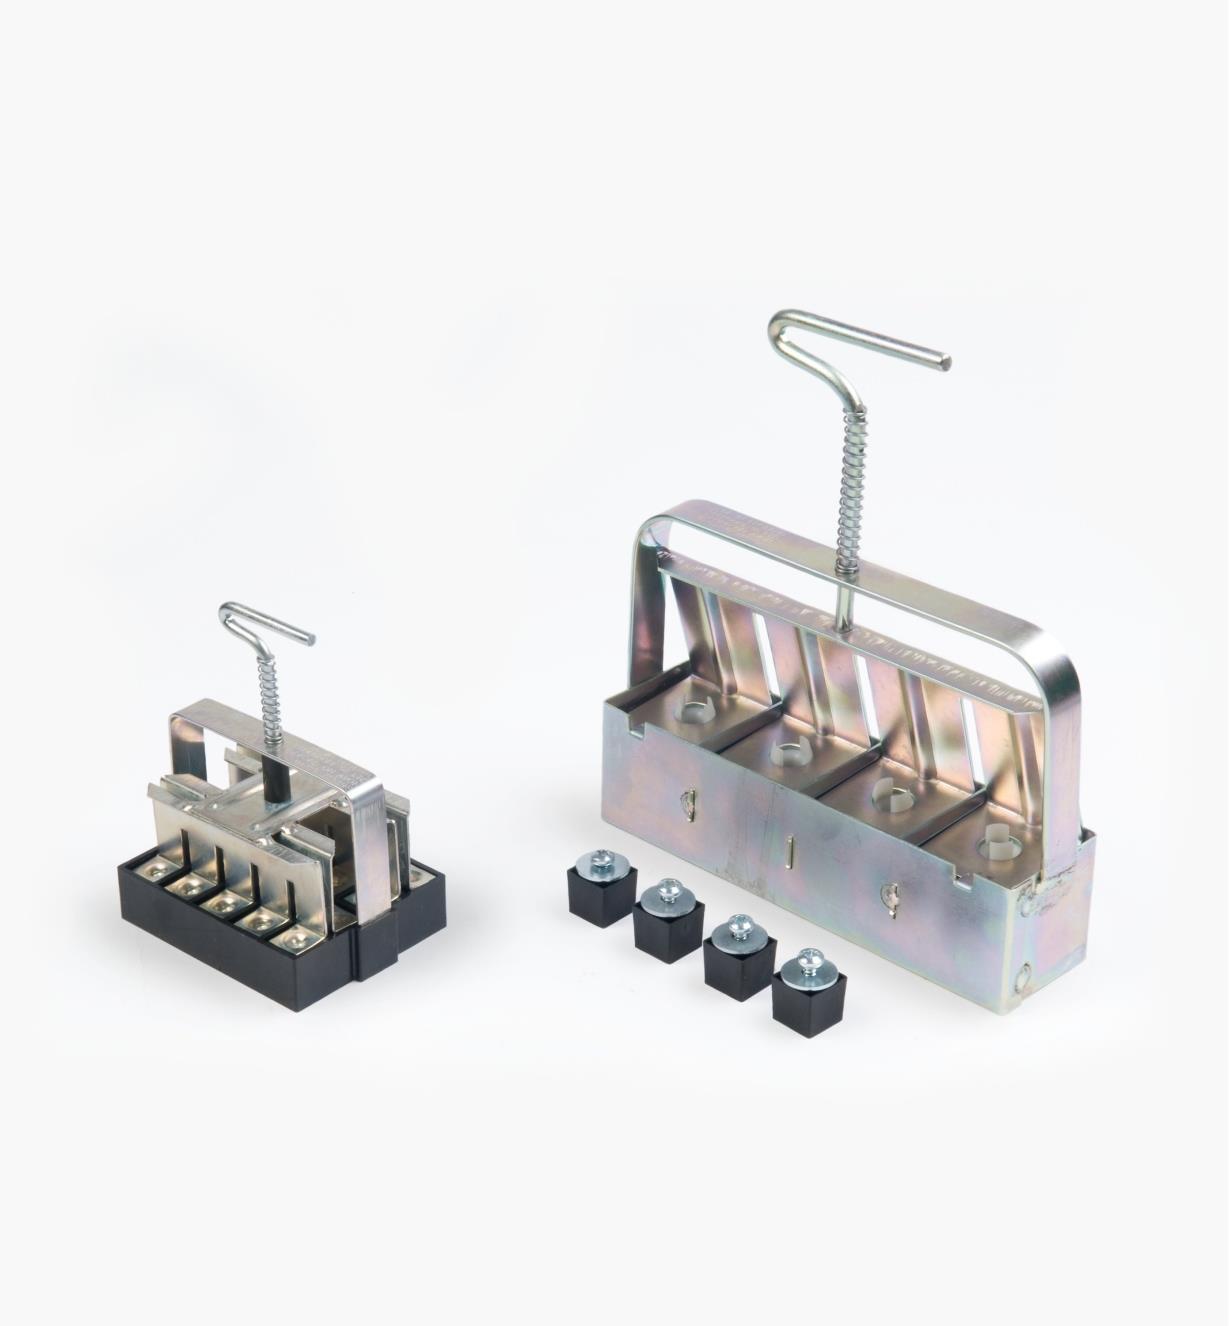 XK906 - Ensemble de presse-mottes